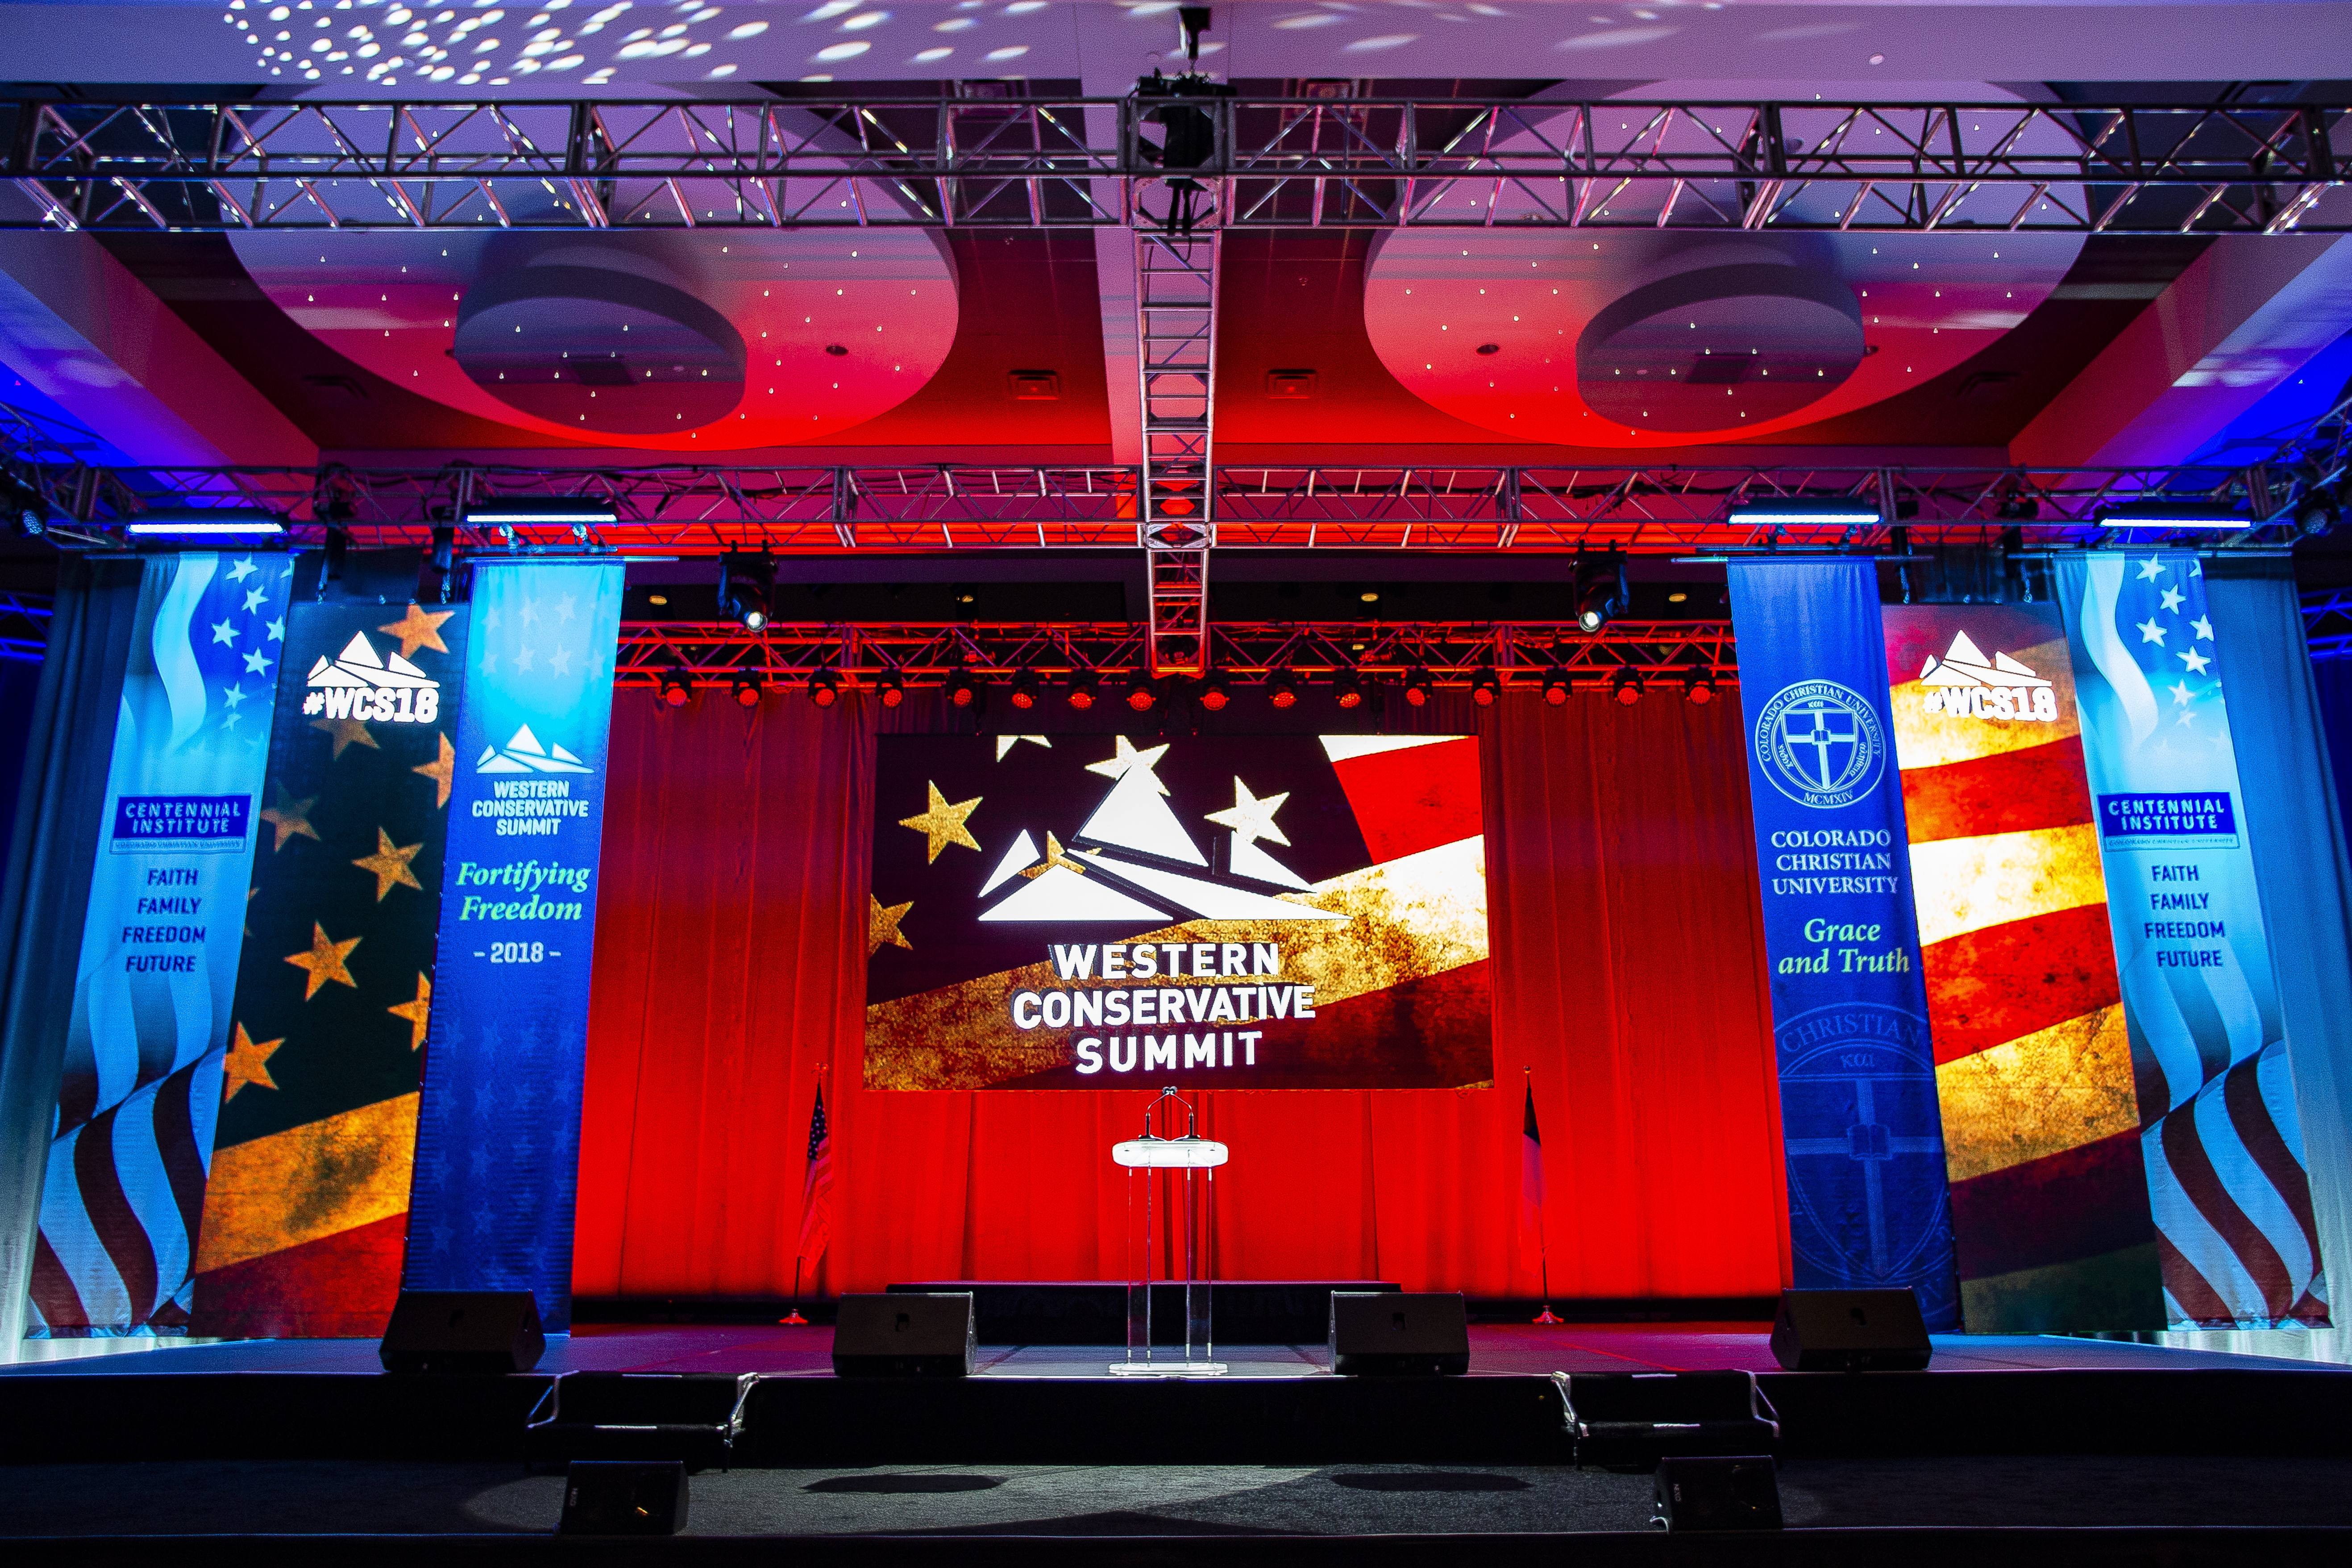 Western Conservative Summit underway in Denver, advancing faith, famil